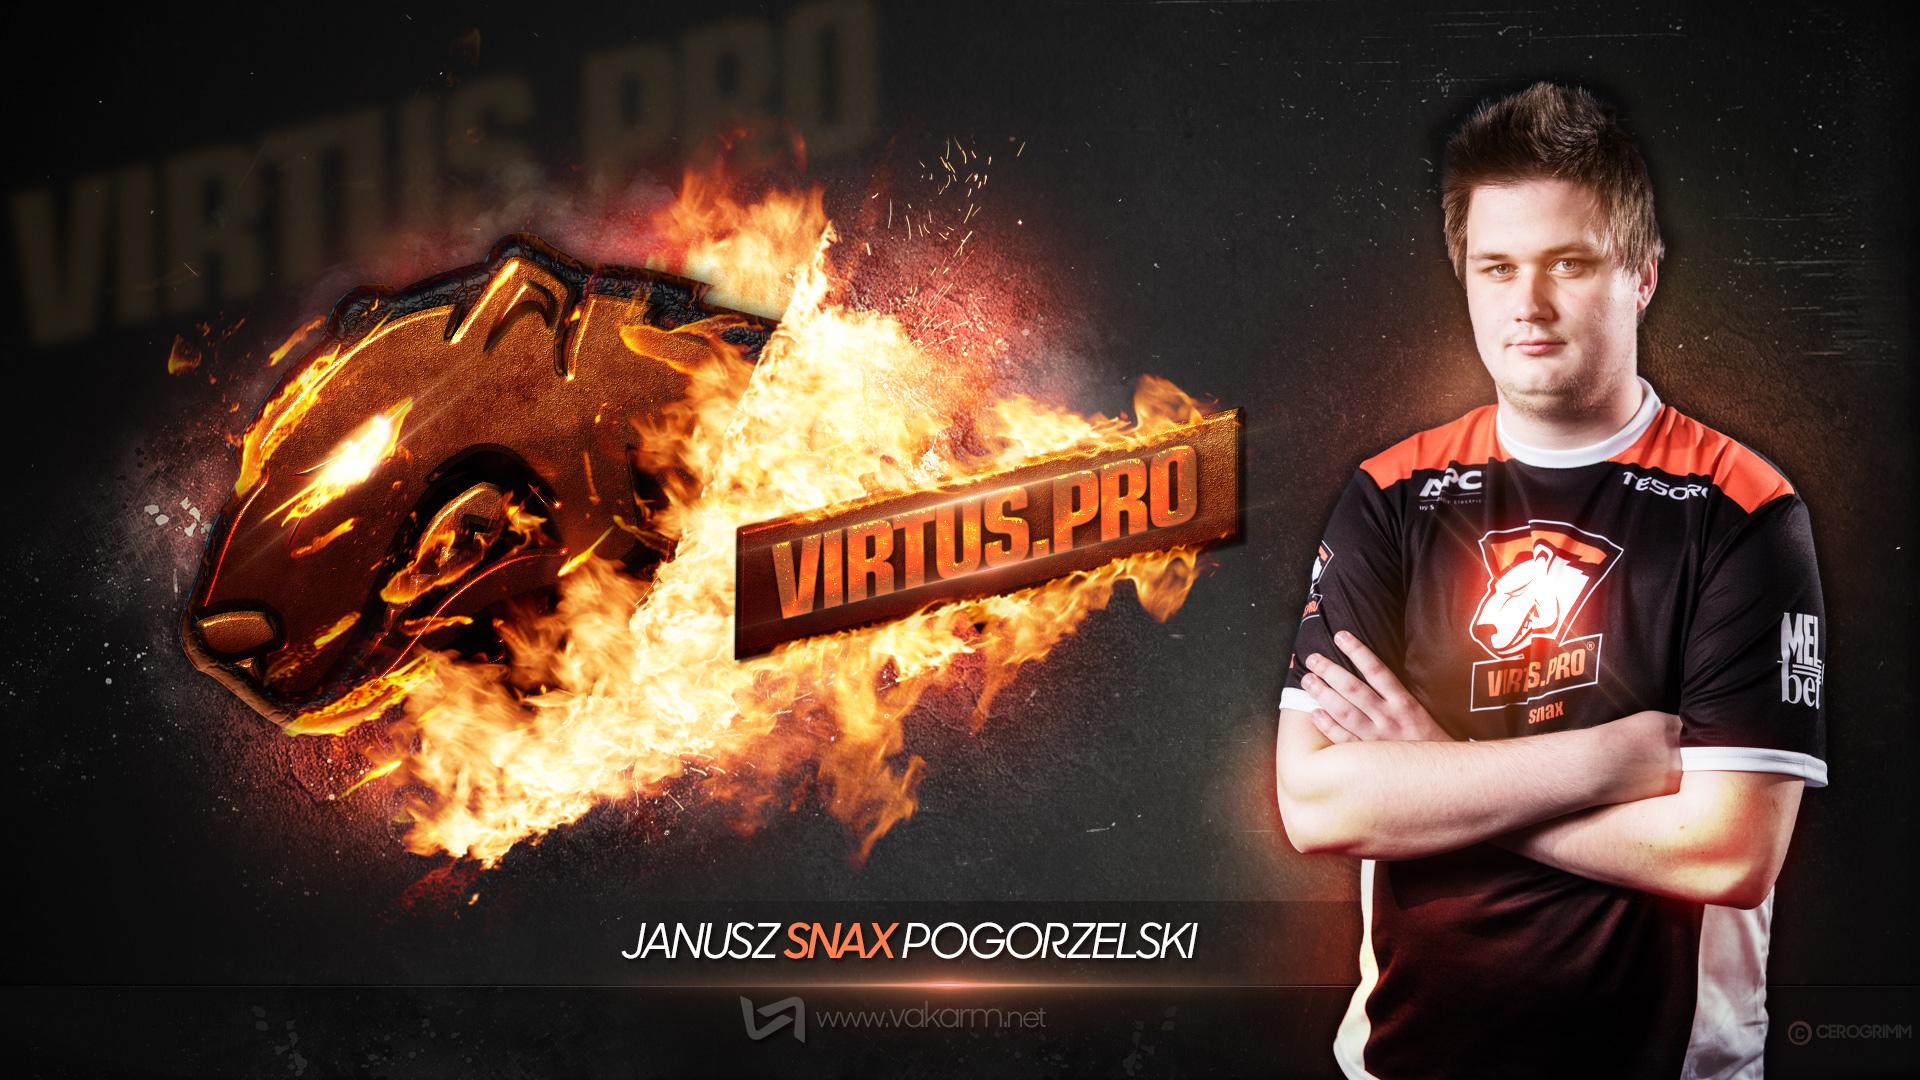 Virtus.pro Snax